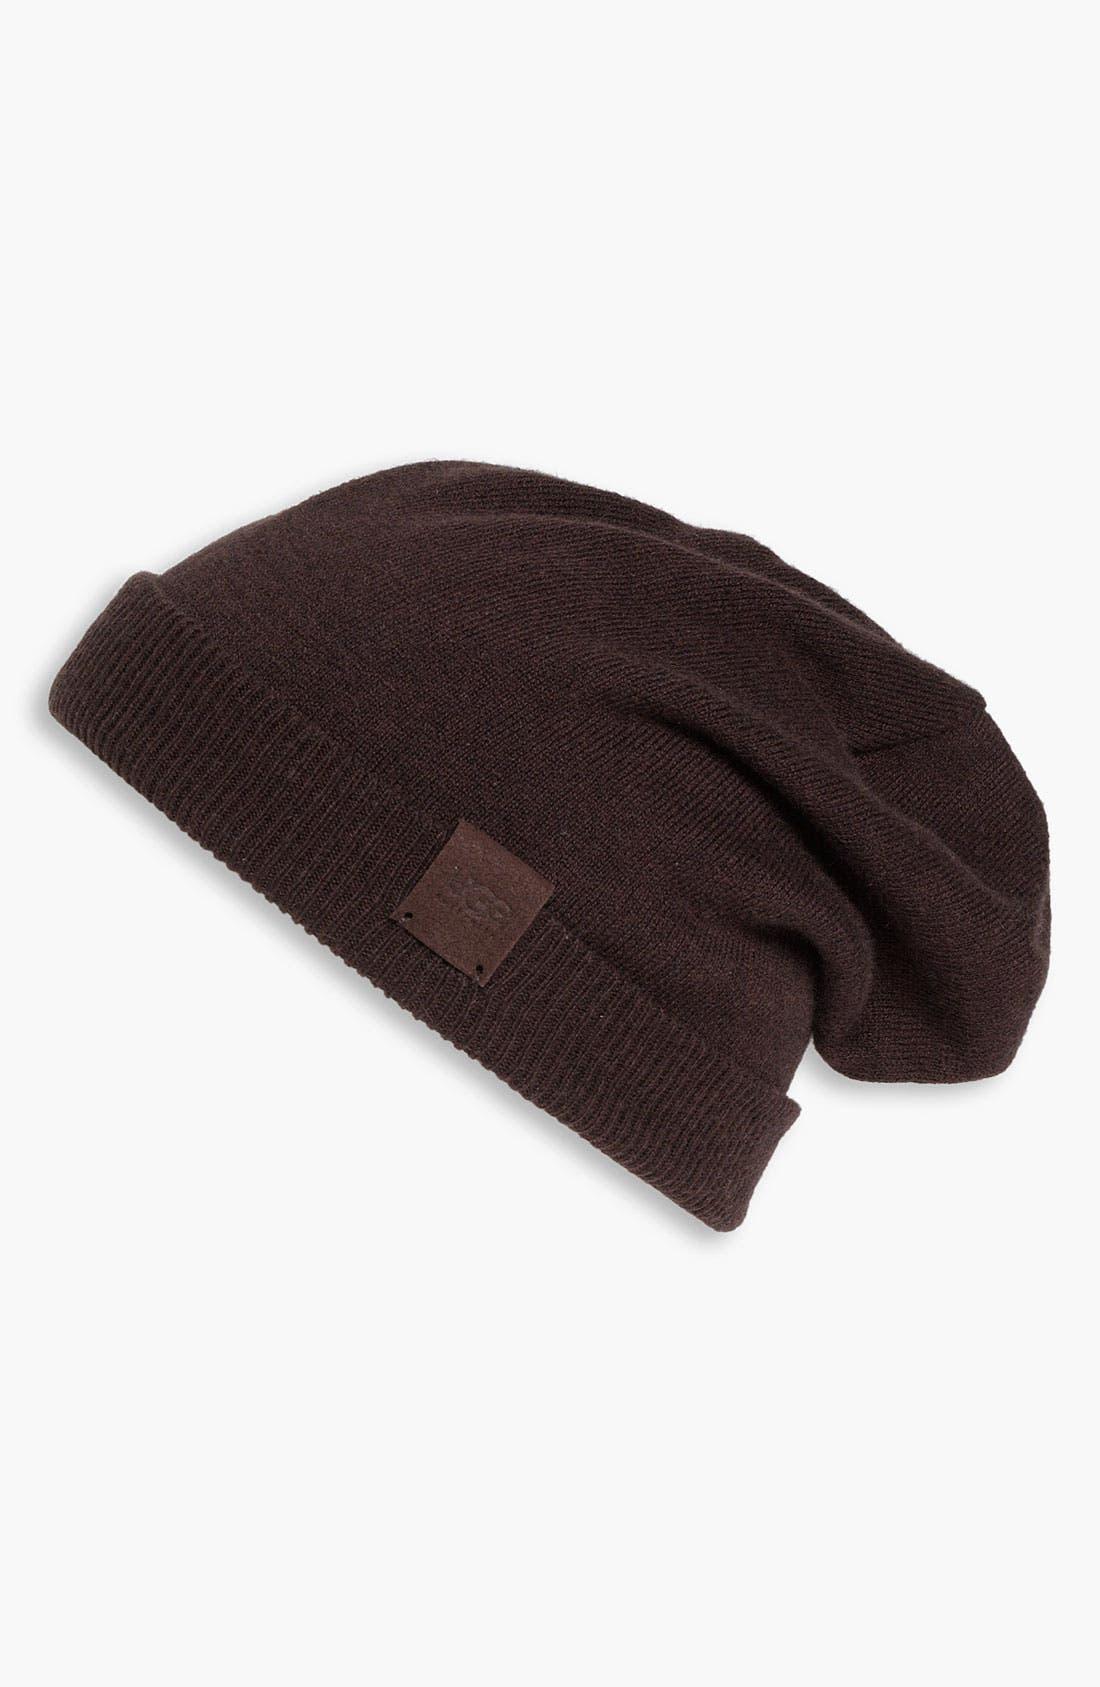 Main Image - UGG® Australia Reversible Knit Cap